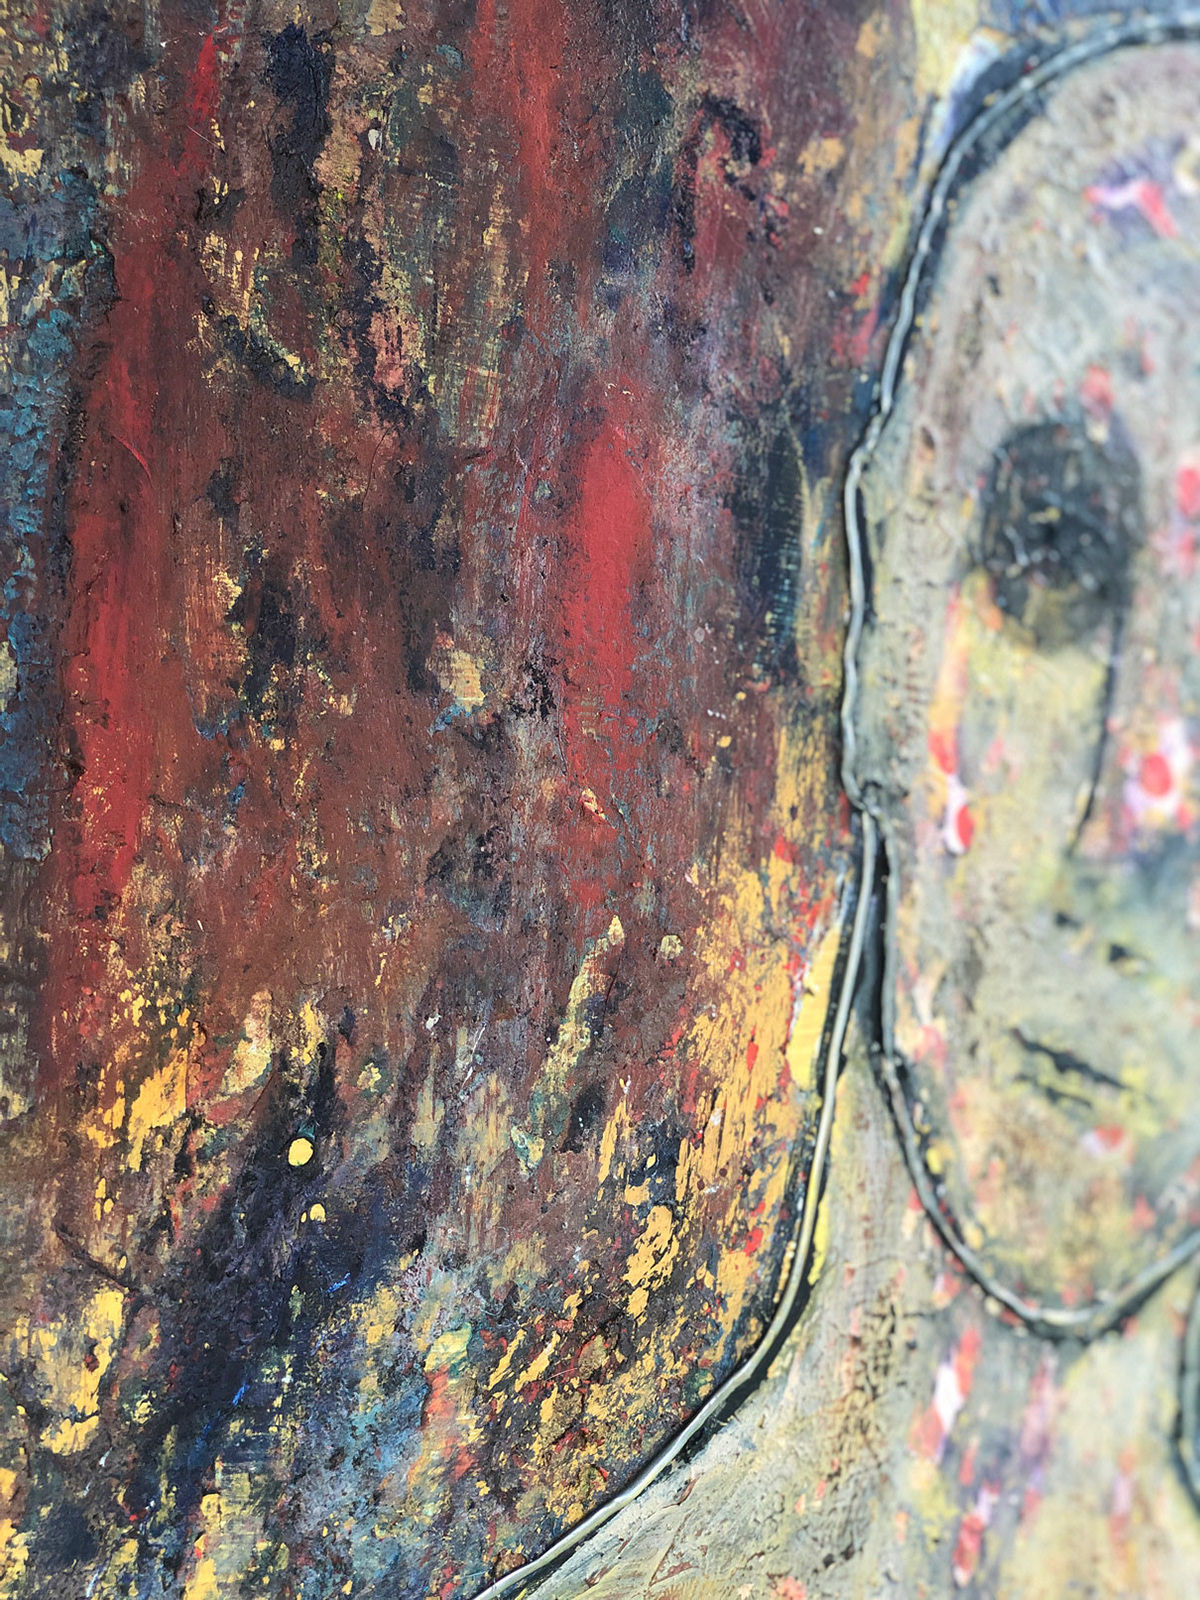 Image may contain: abstract, drawing and art